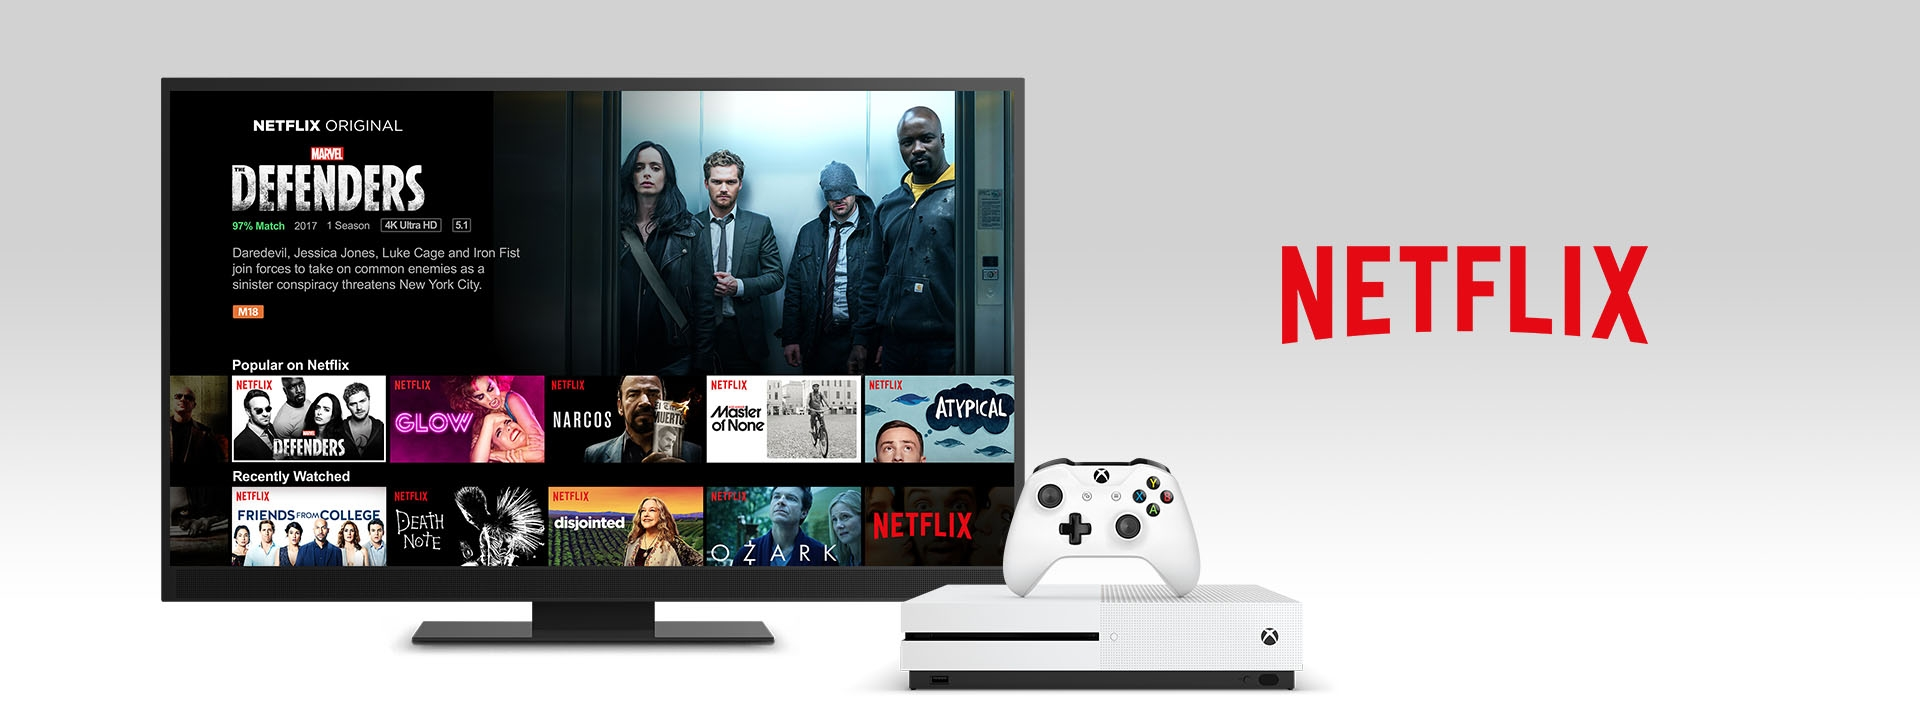 Netflix on an Xbox One